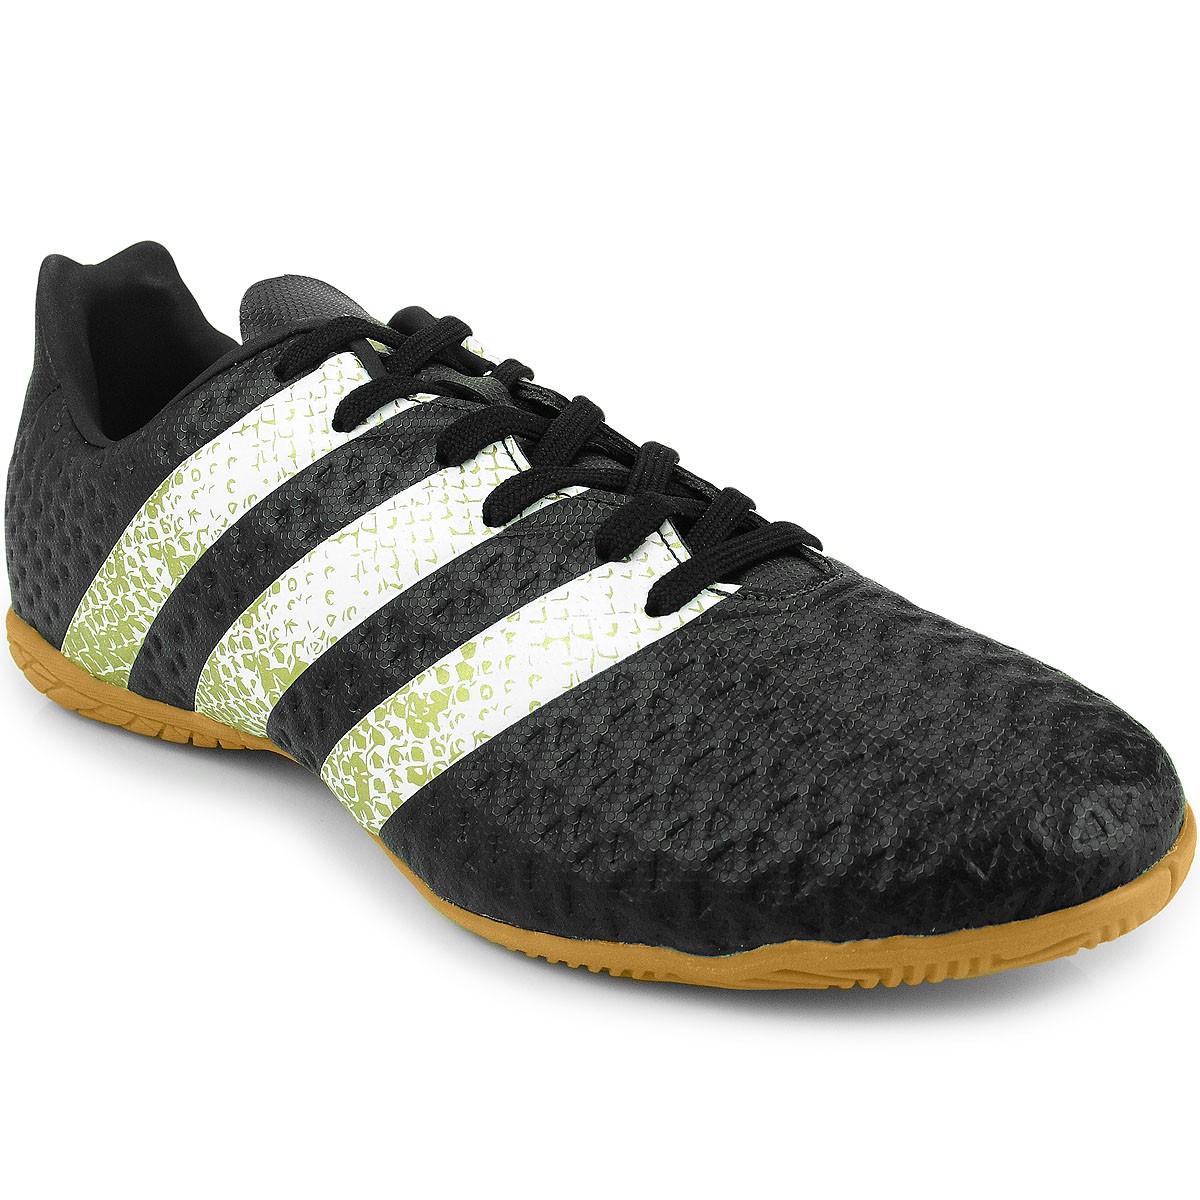 a85ff3cc4b Chuteira Adidas Ace 16.4 IN